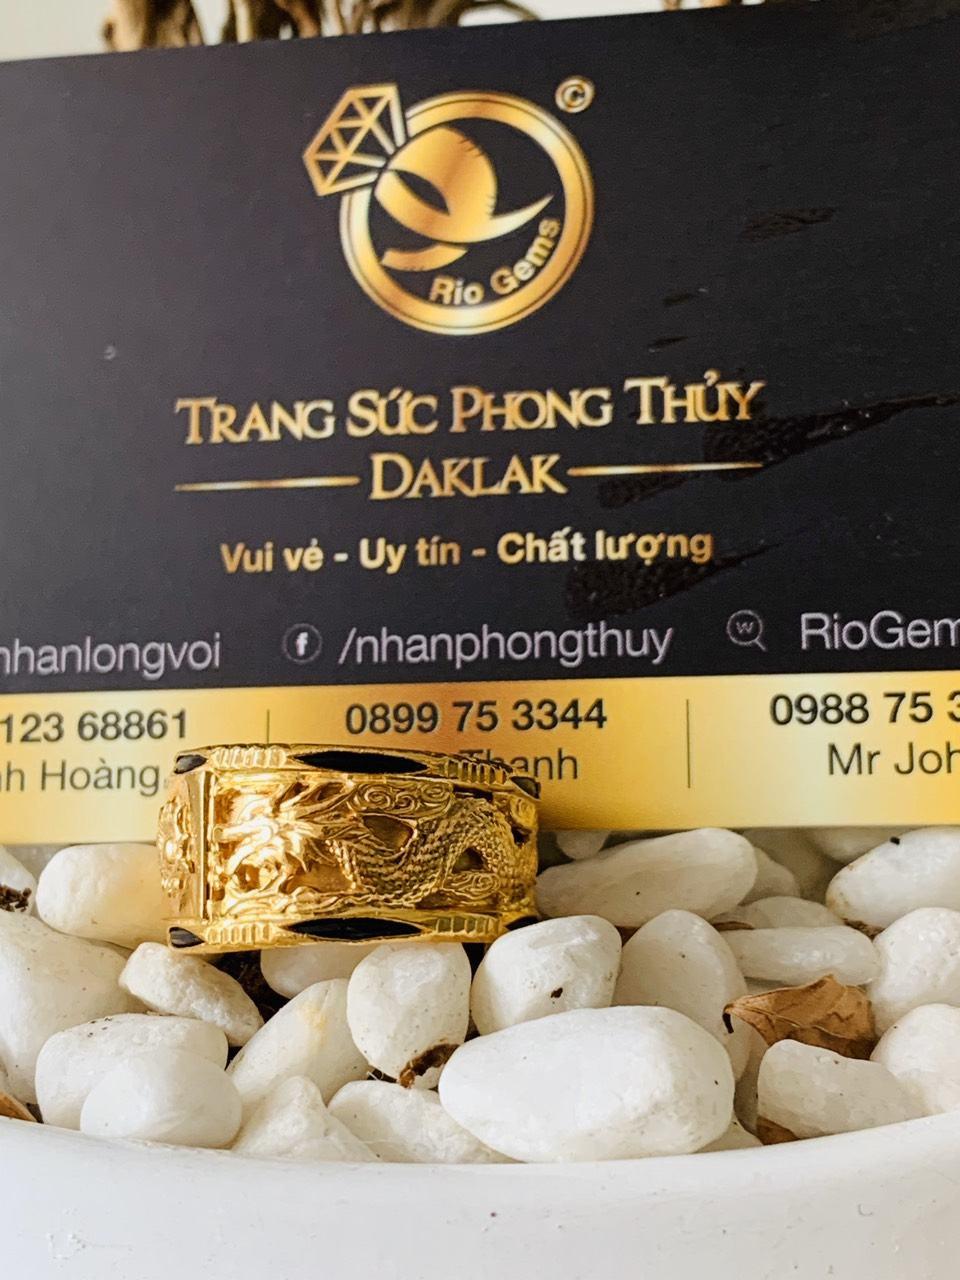 nhan rong phong thuy lua vang (37)